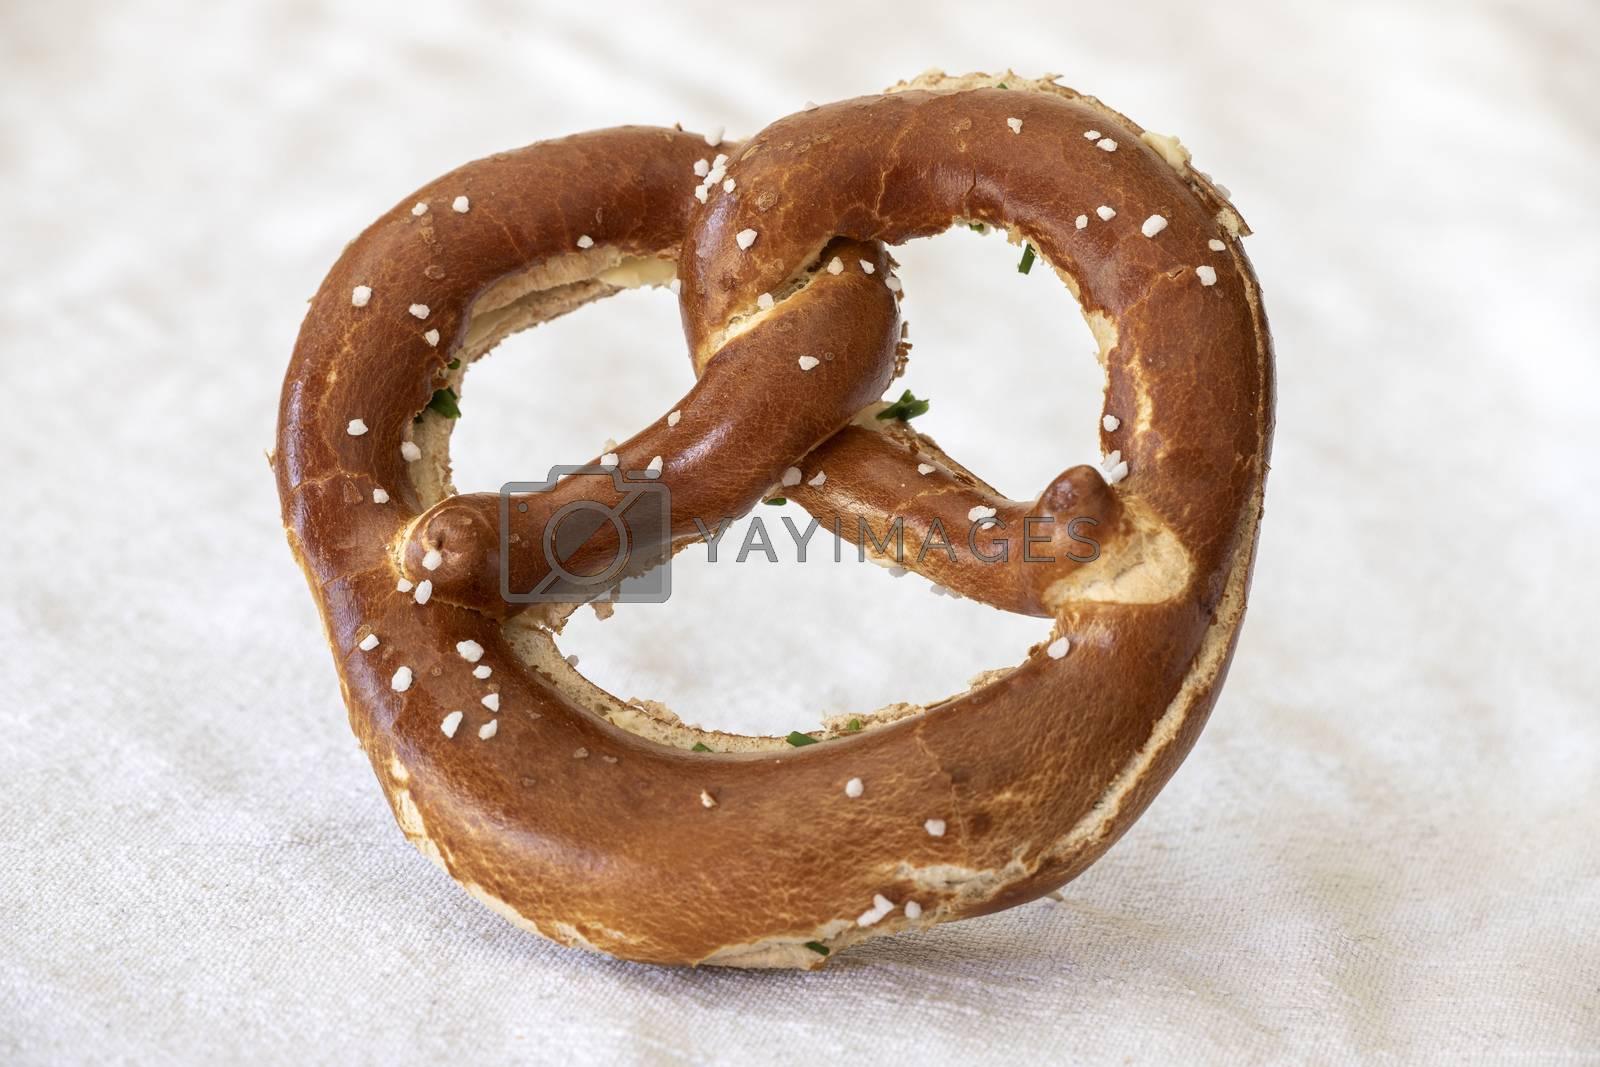 bavarian pretzel with butter on white